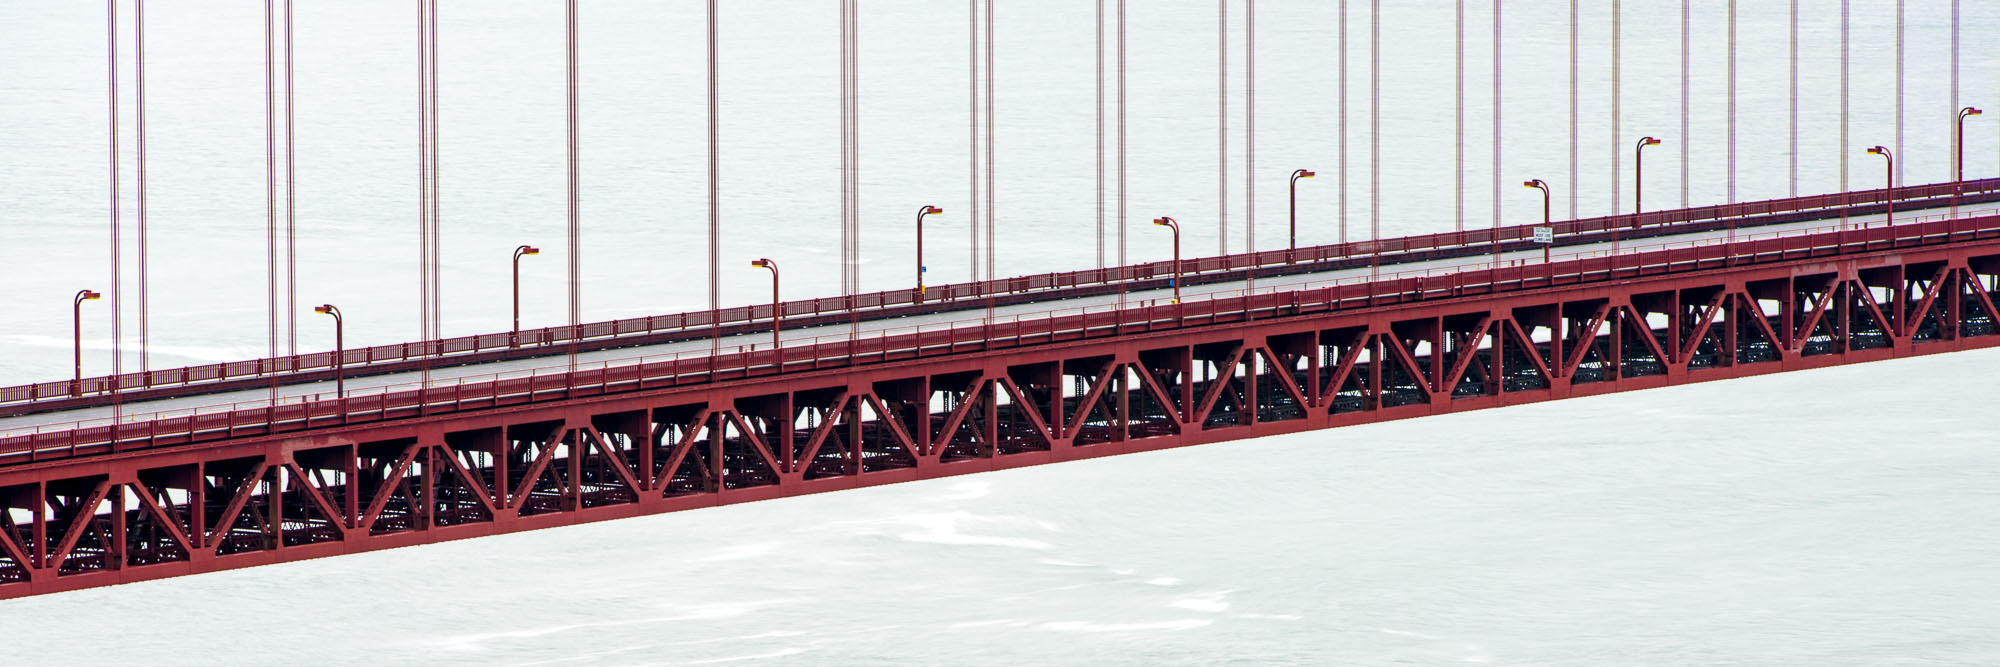 20130106_San Francisco_3367.jpg